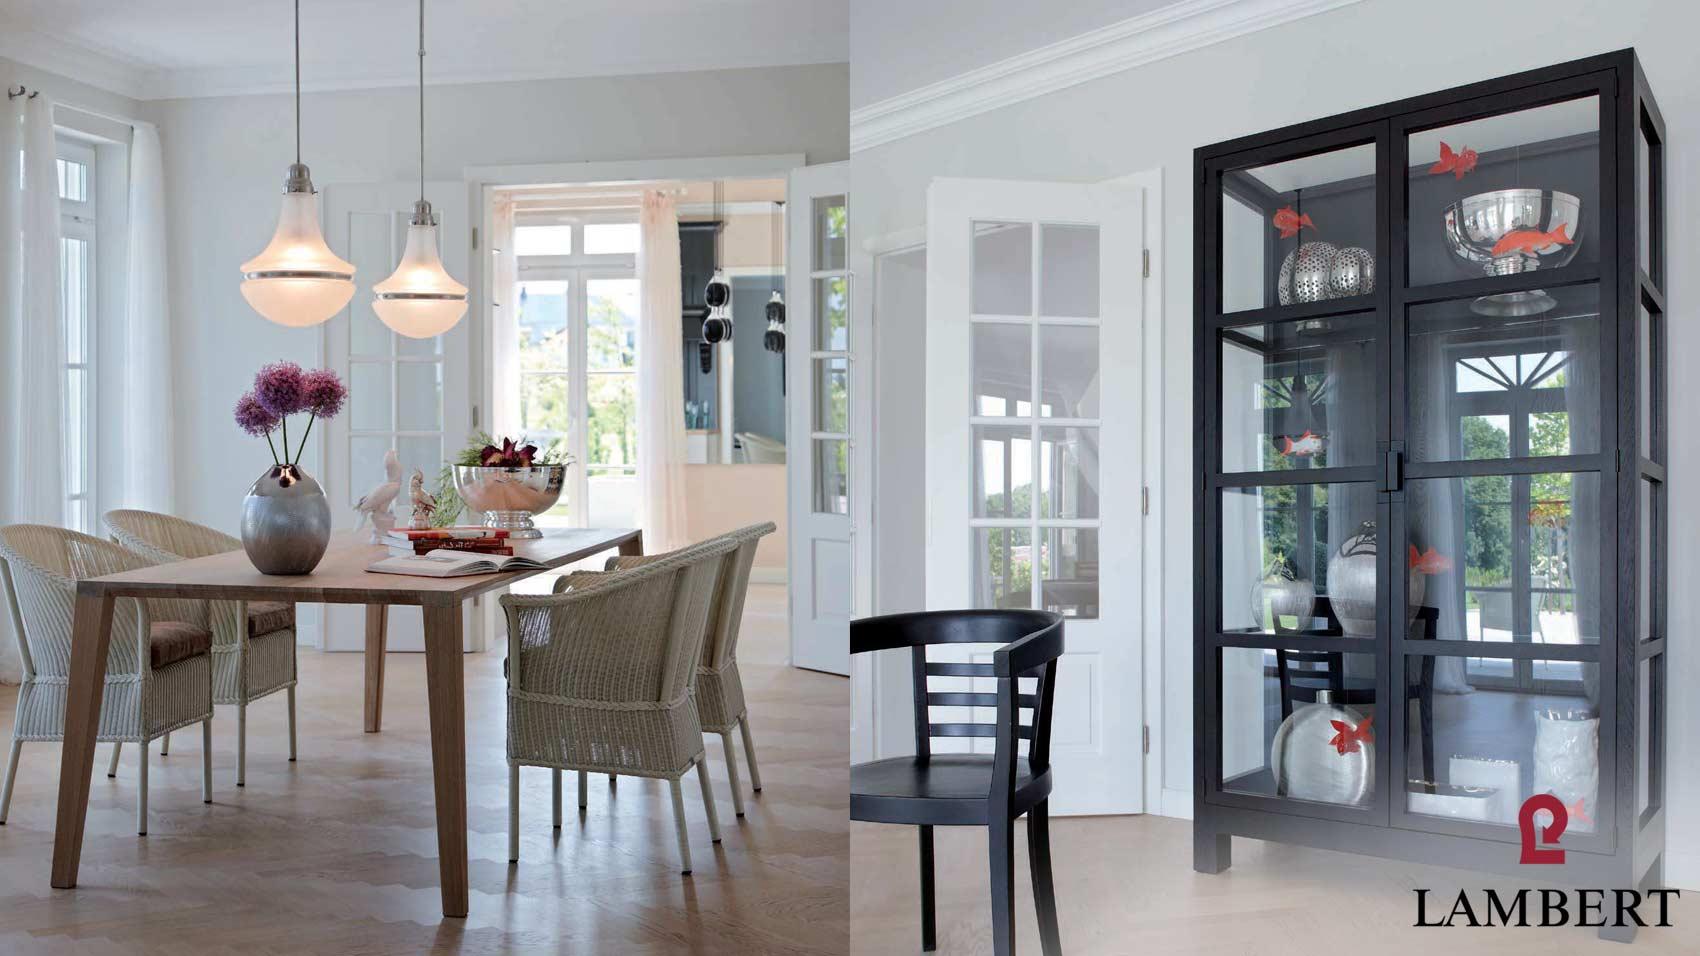 lambert wohnaccessoires nahe erfurt weimar jena m bel u k chen by land blankenhain. Black Bedroom Furniture Sets. Home Design Ideas